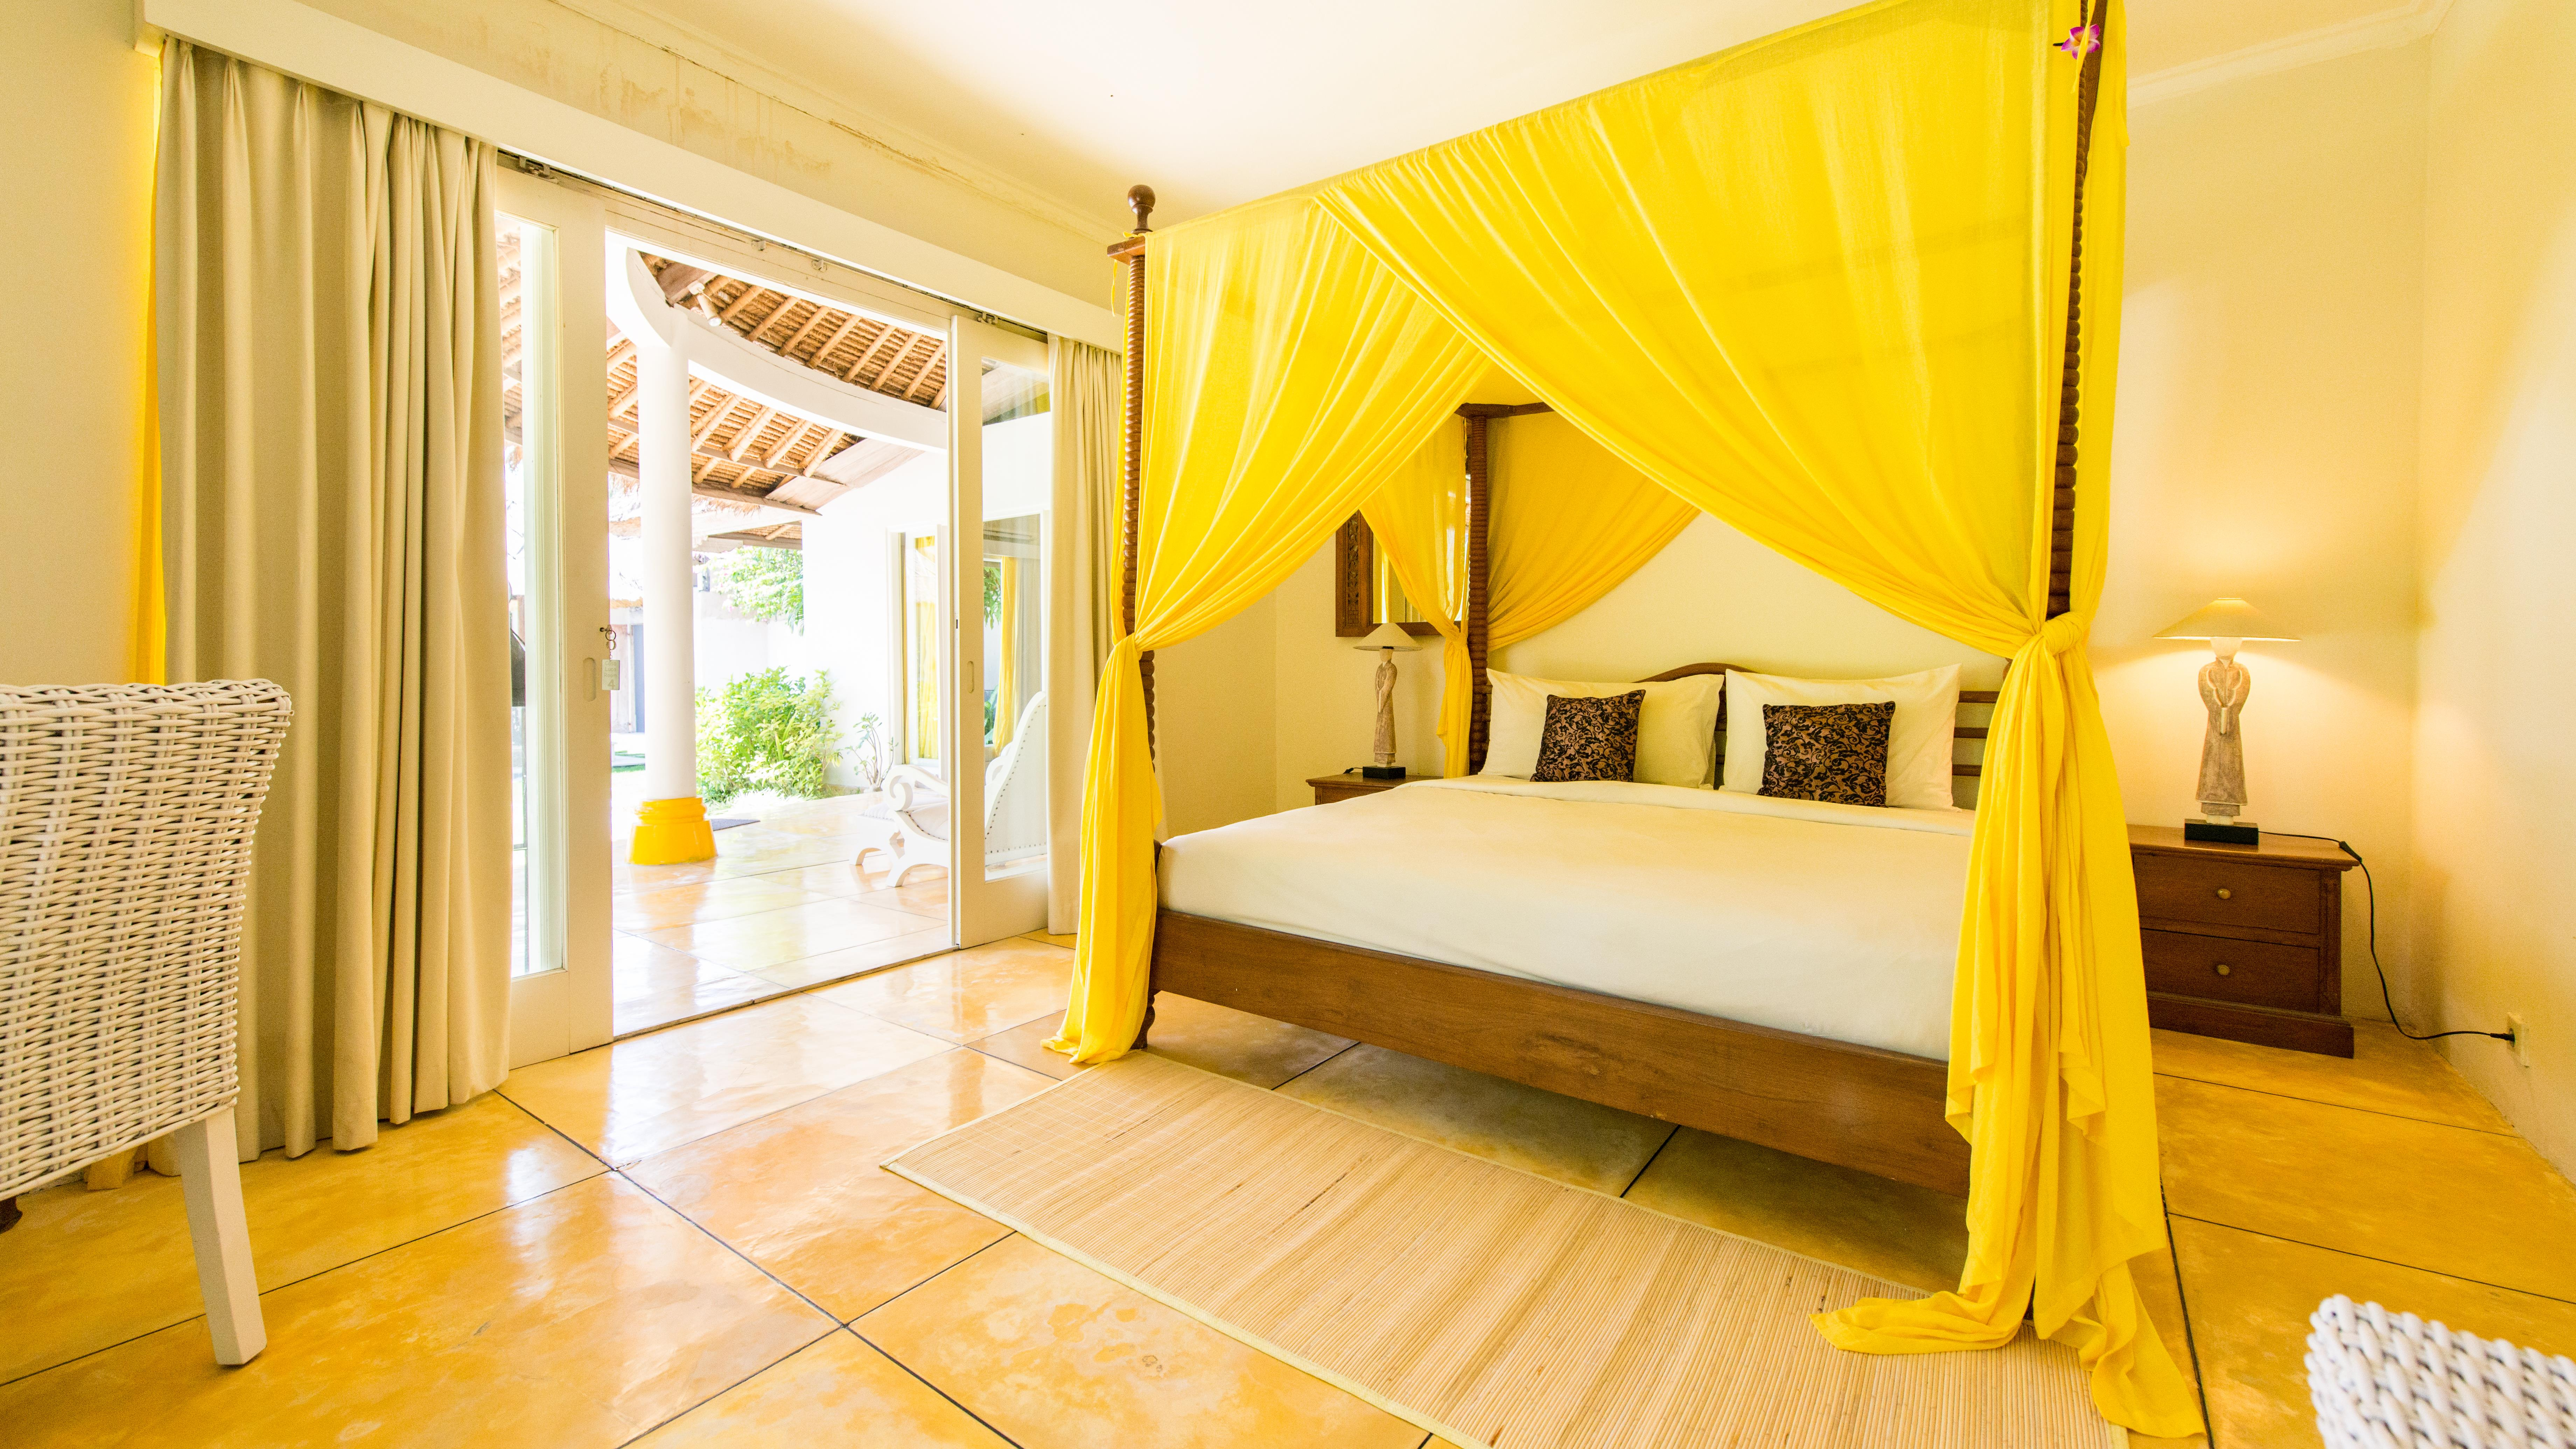 Bedroom with Seating Area - Casa Lucas - Seminyak, Bali